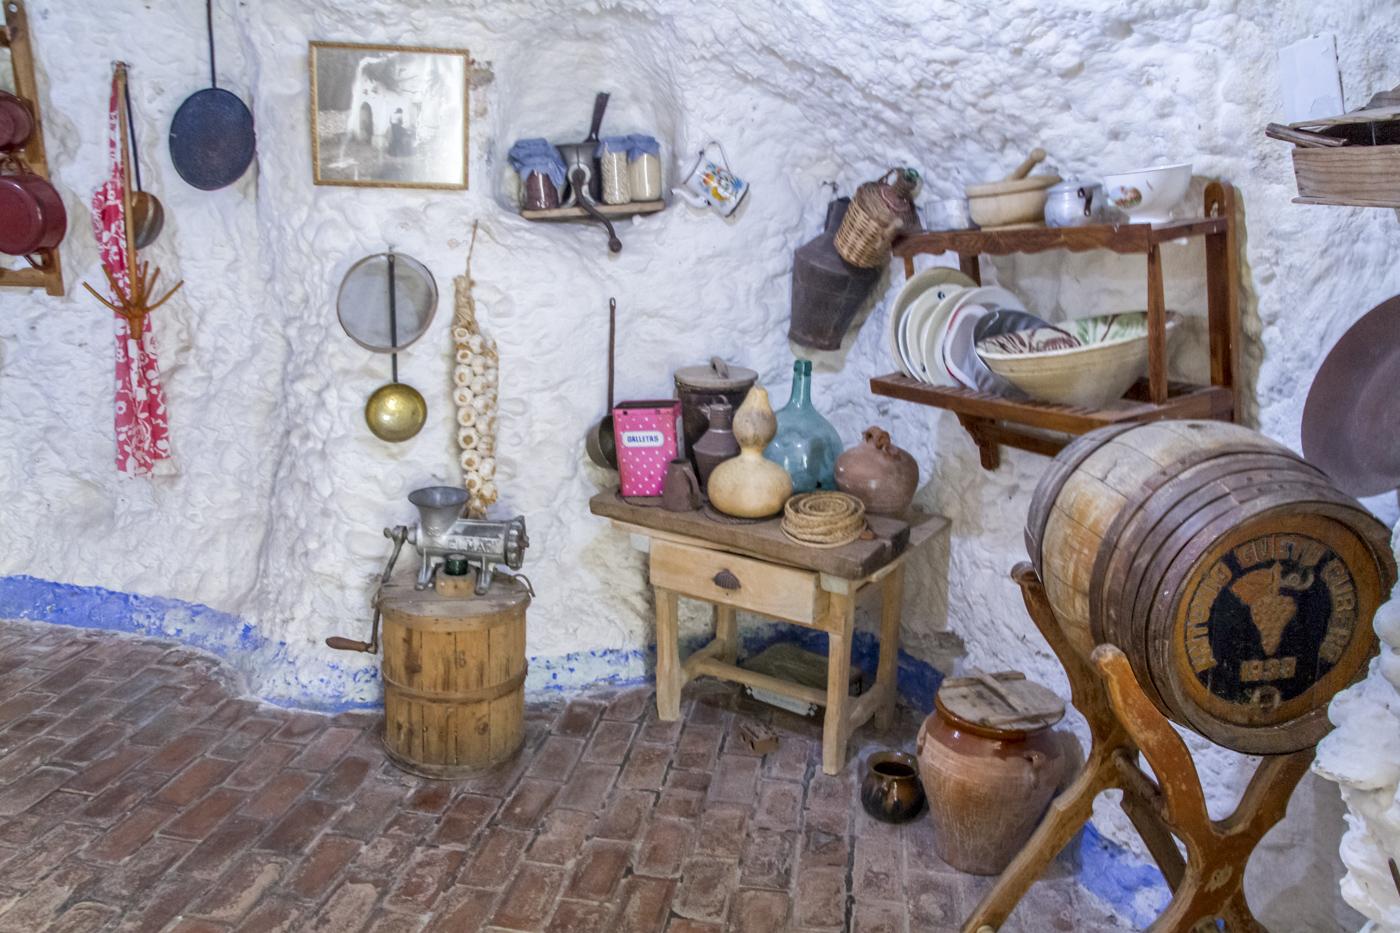 Cuevas du musée du Sacromonte